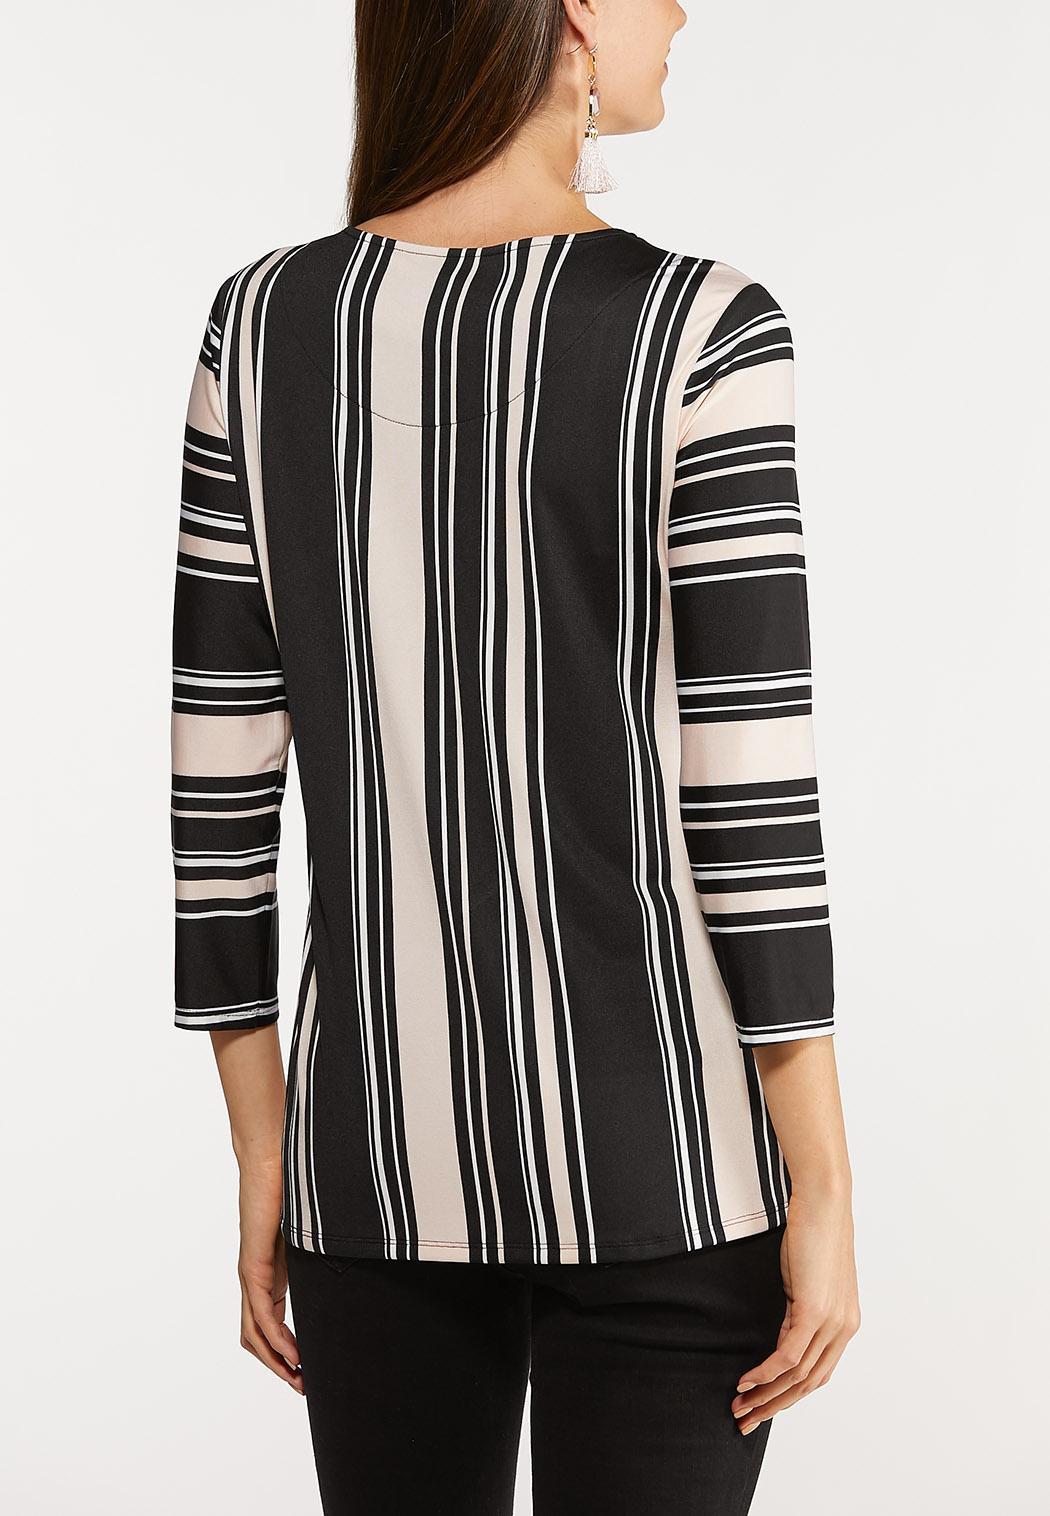 Asymmetrical Hem Stripe Top (Item #44132669)